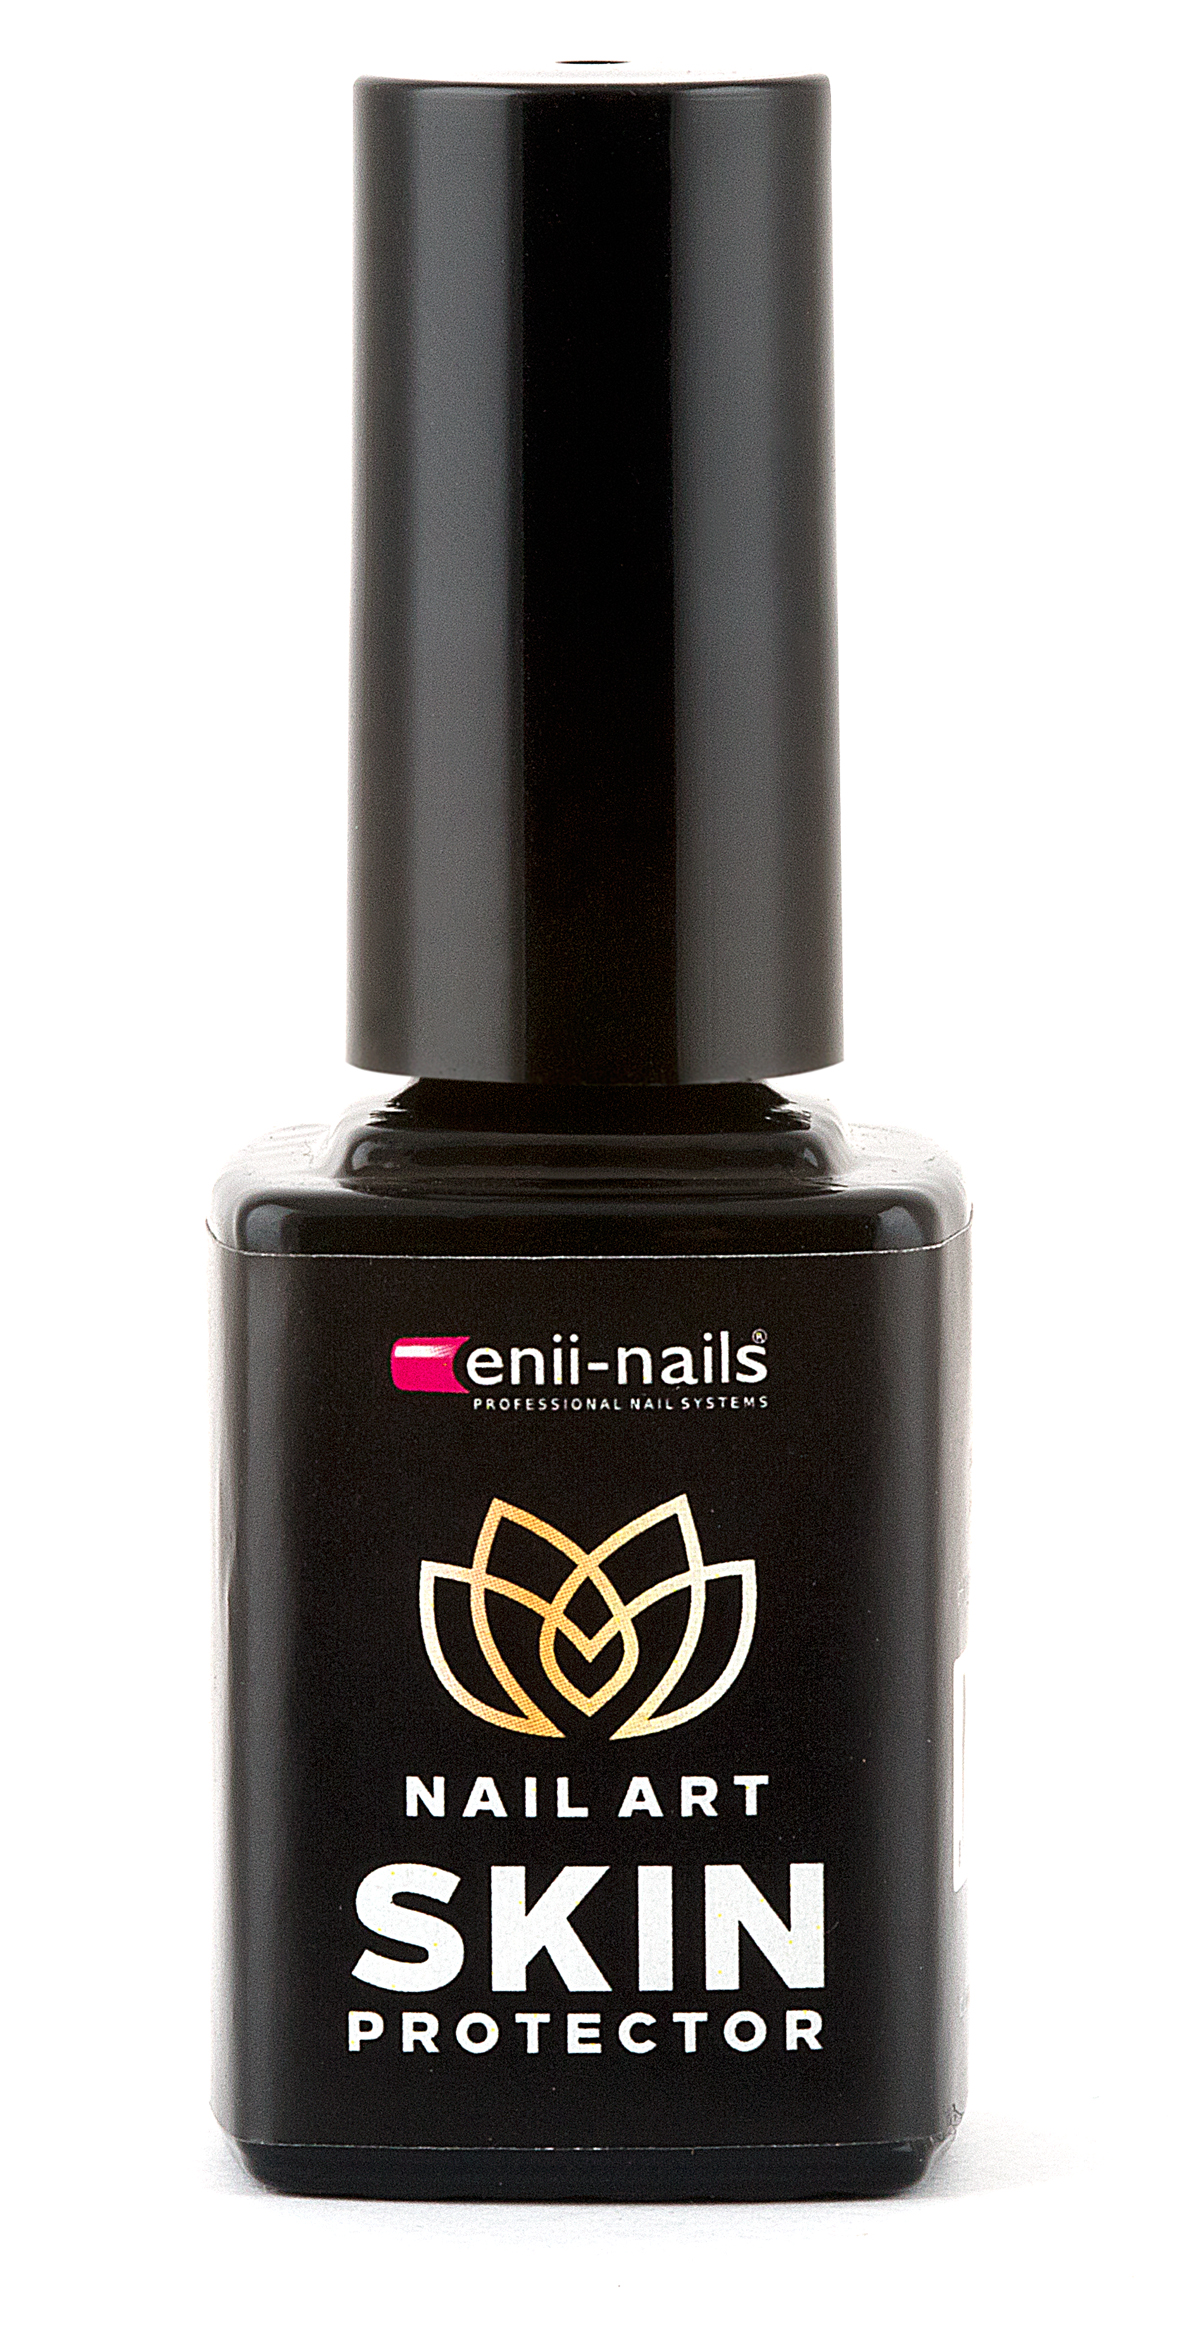 ENII-NAILS Nail Art Skin 11 ml